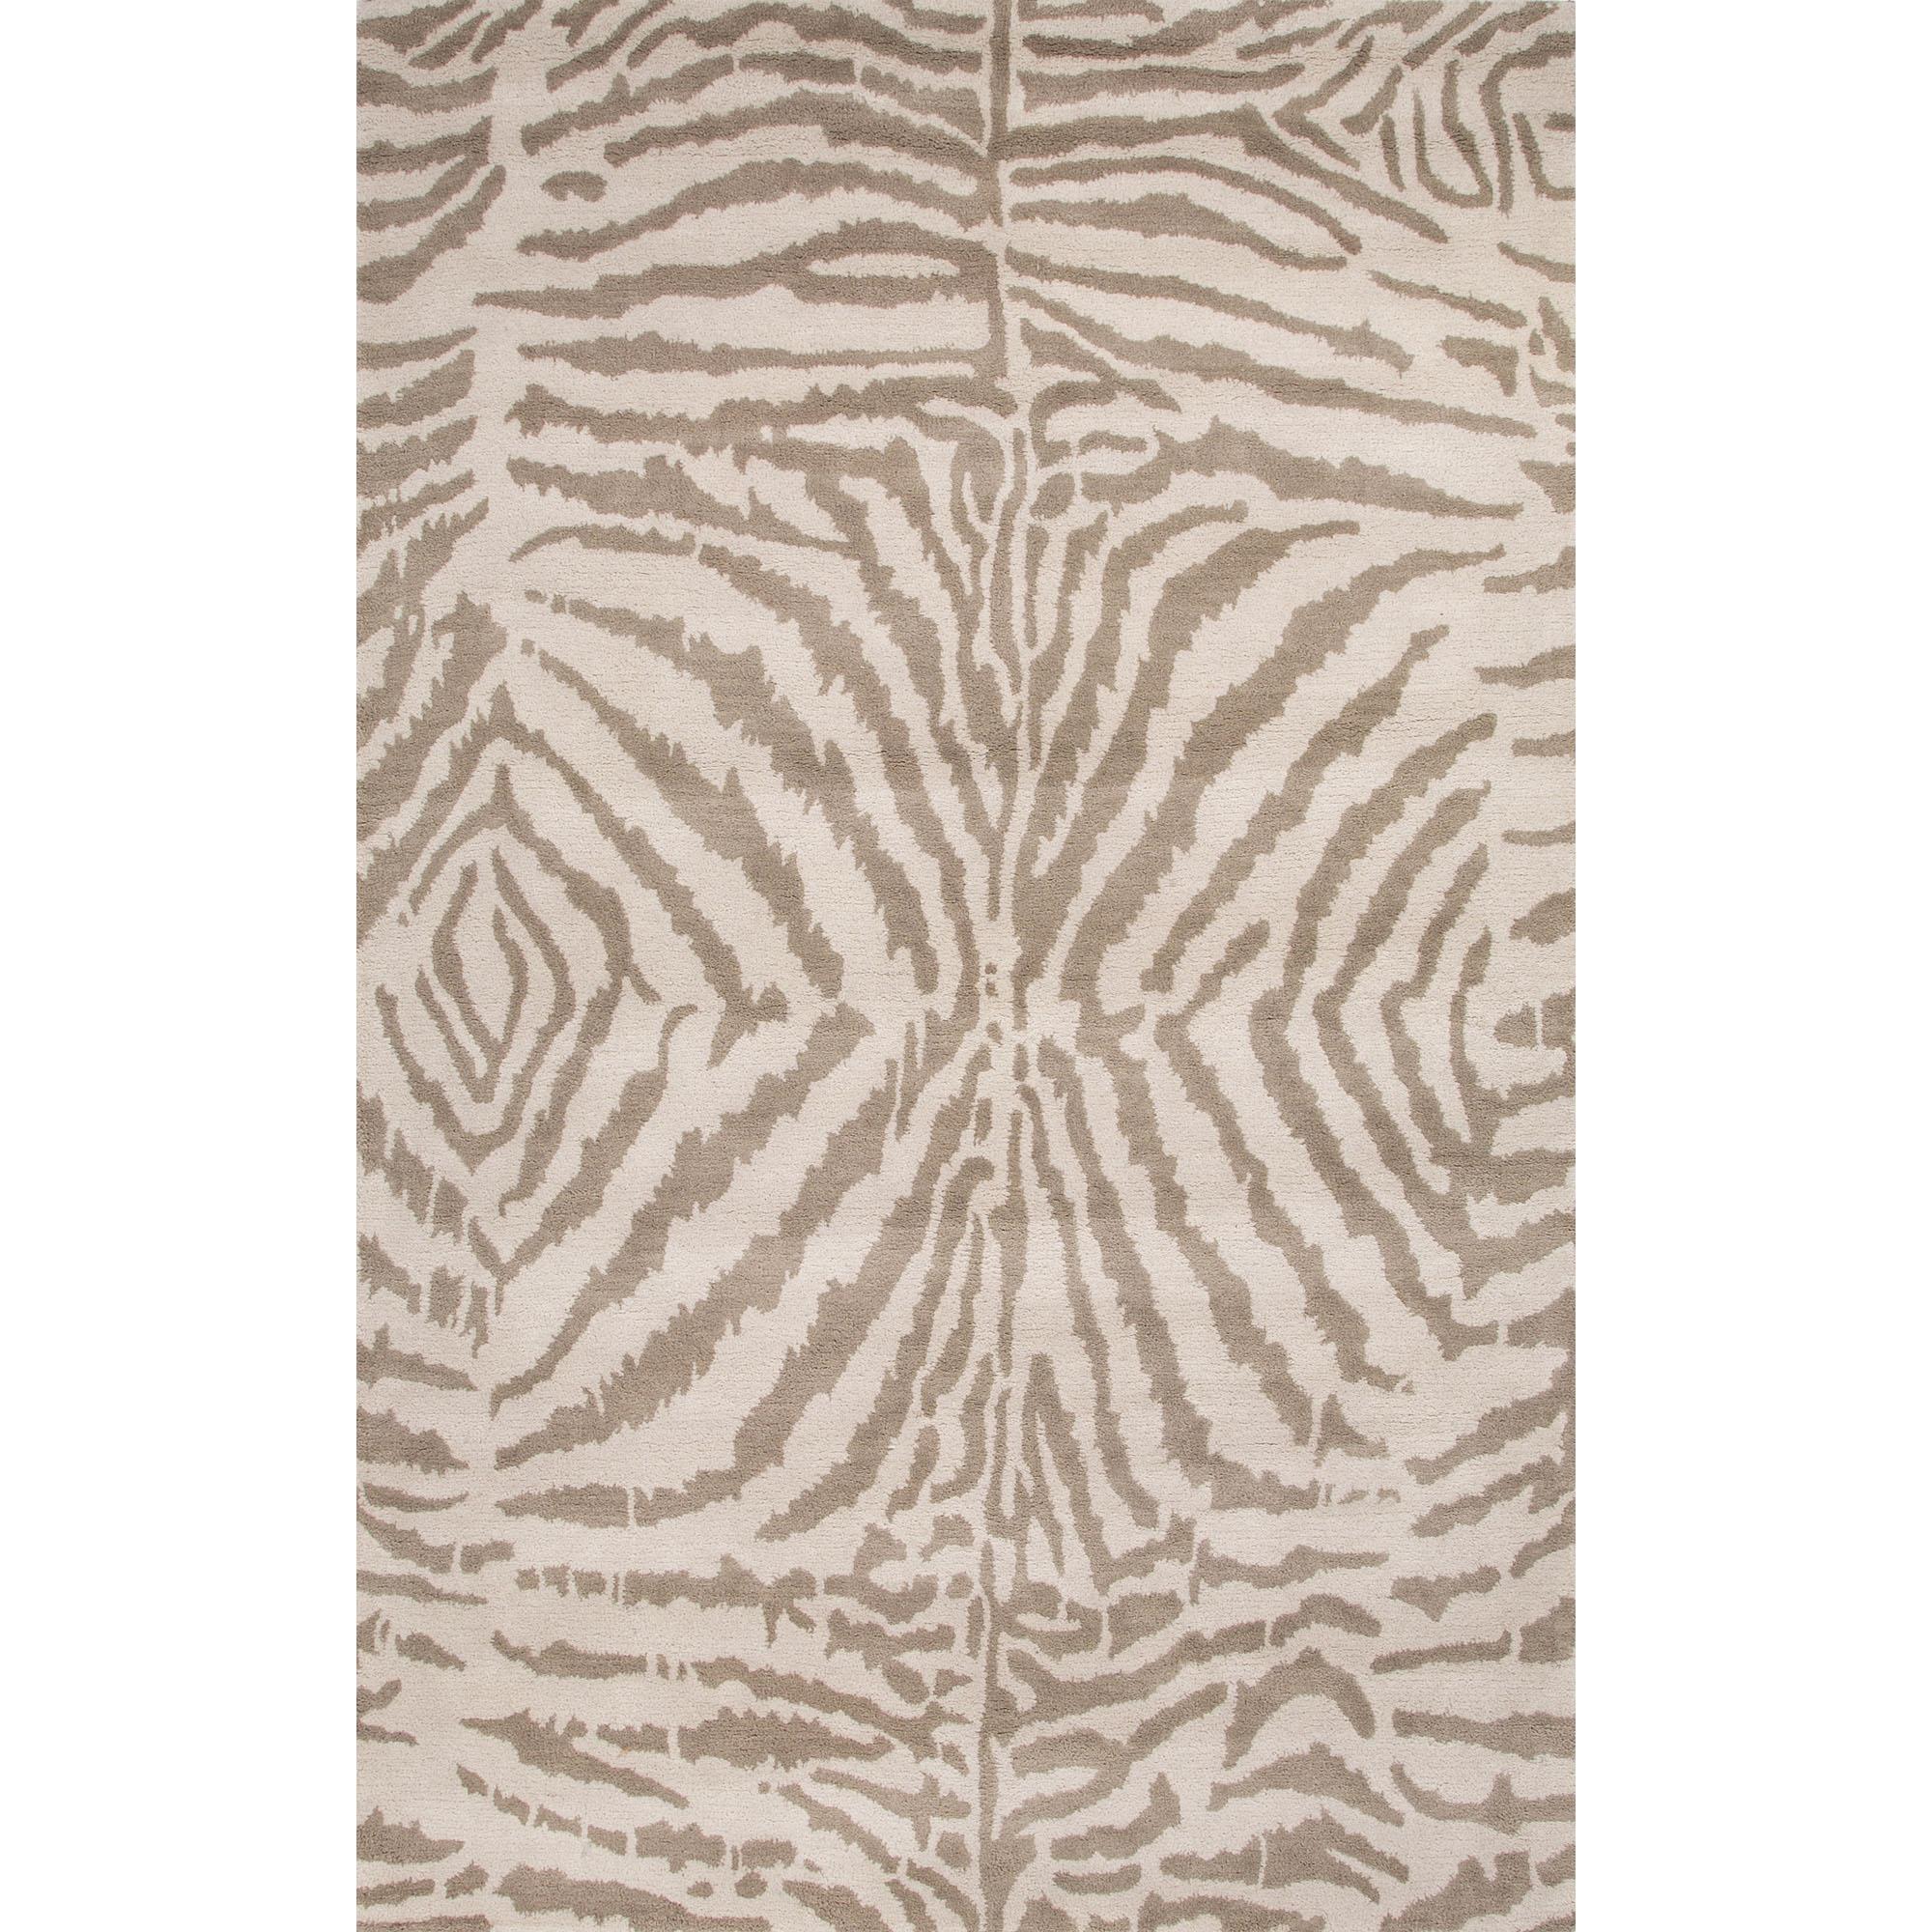 JAIPUR Rugs En Casa By Luli Sanchez Tufted 5 x 8 Rug - Item Number: RUG116023